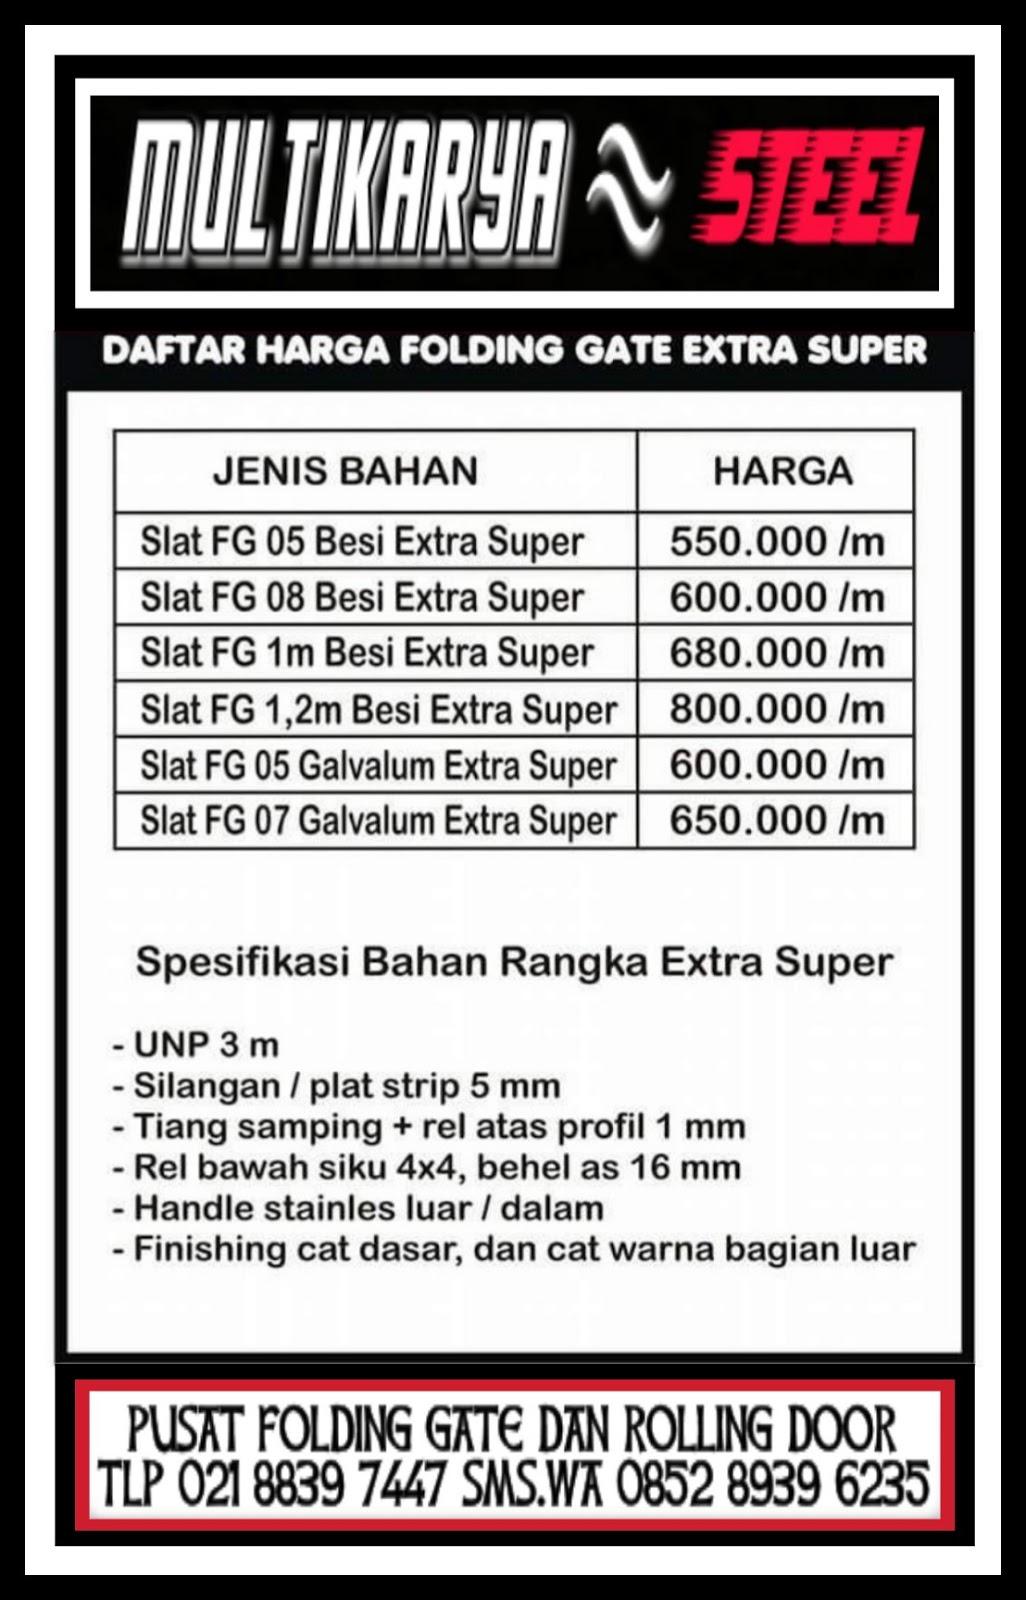 Daftar Harga Pintu Folding Gate Purwokerto Murah ~ FOLDING GATE ...